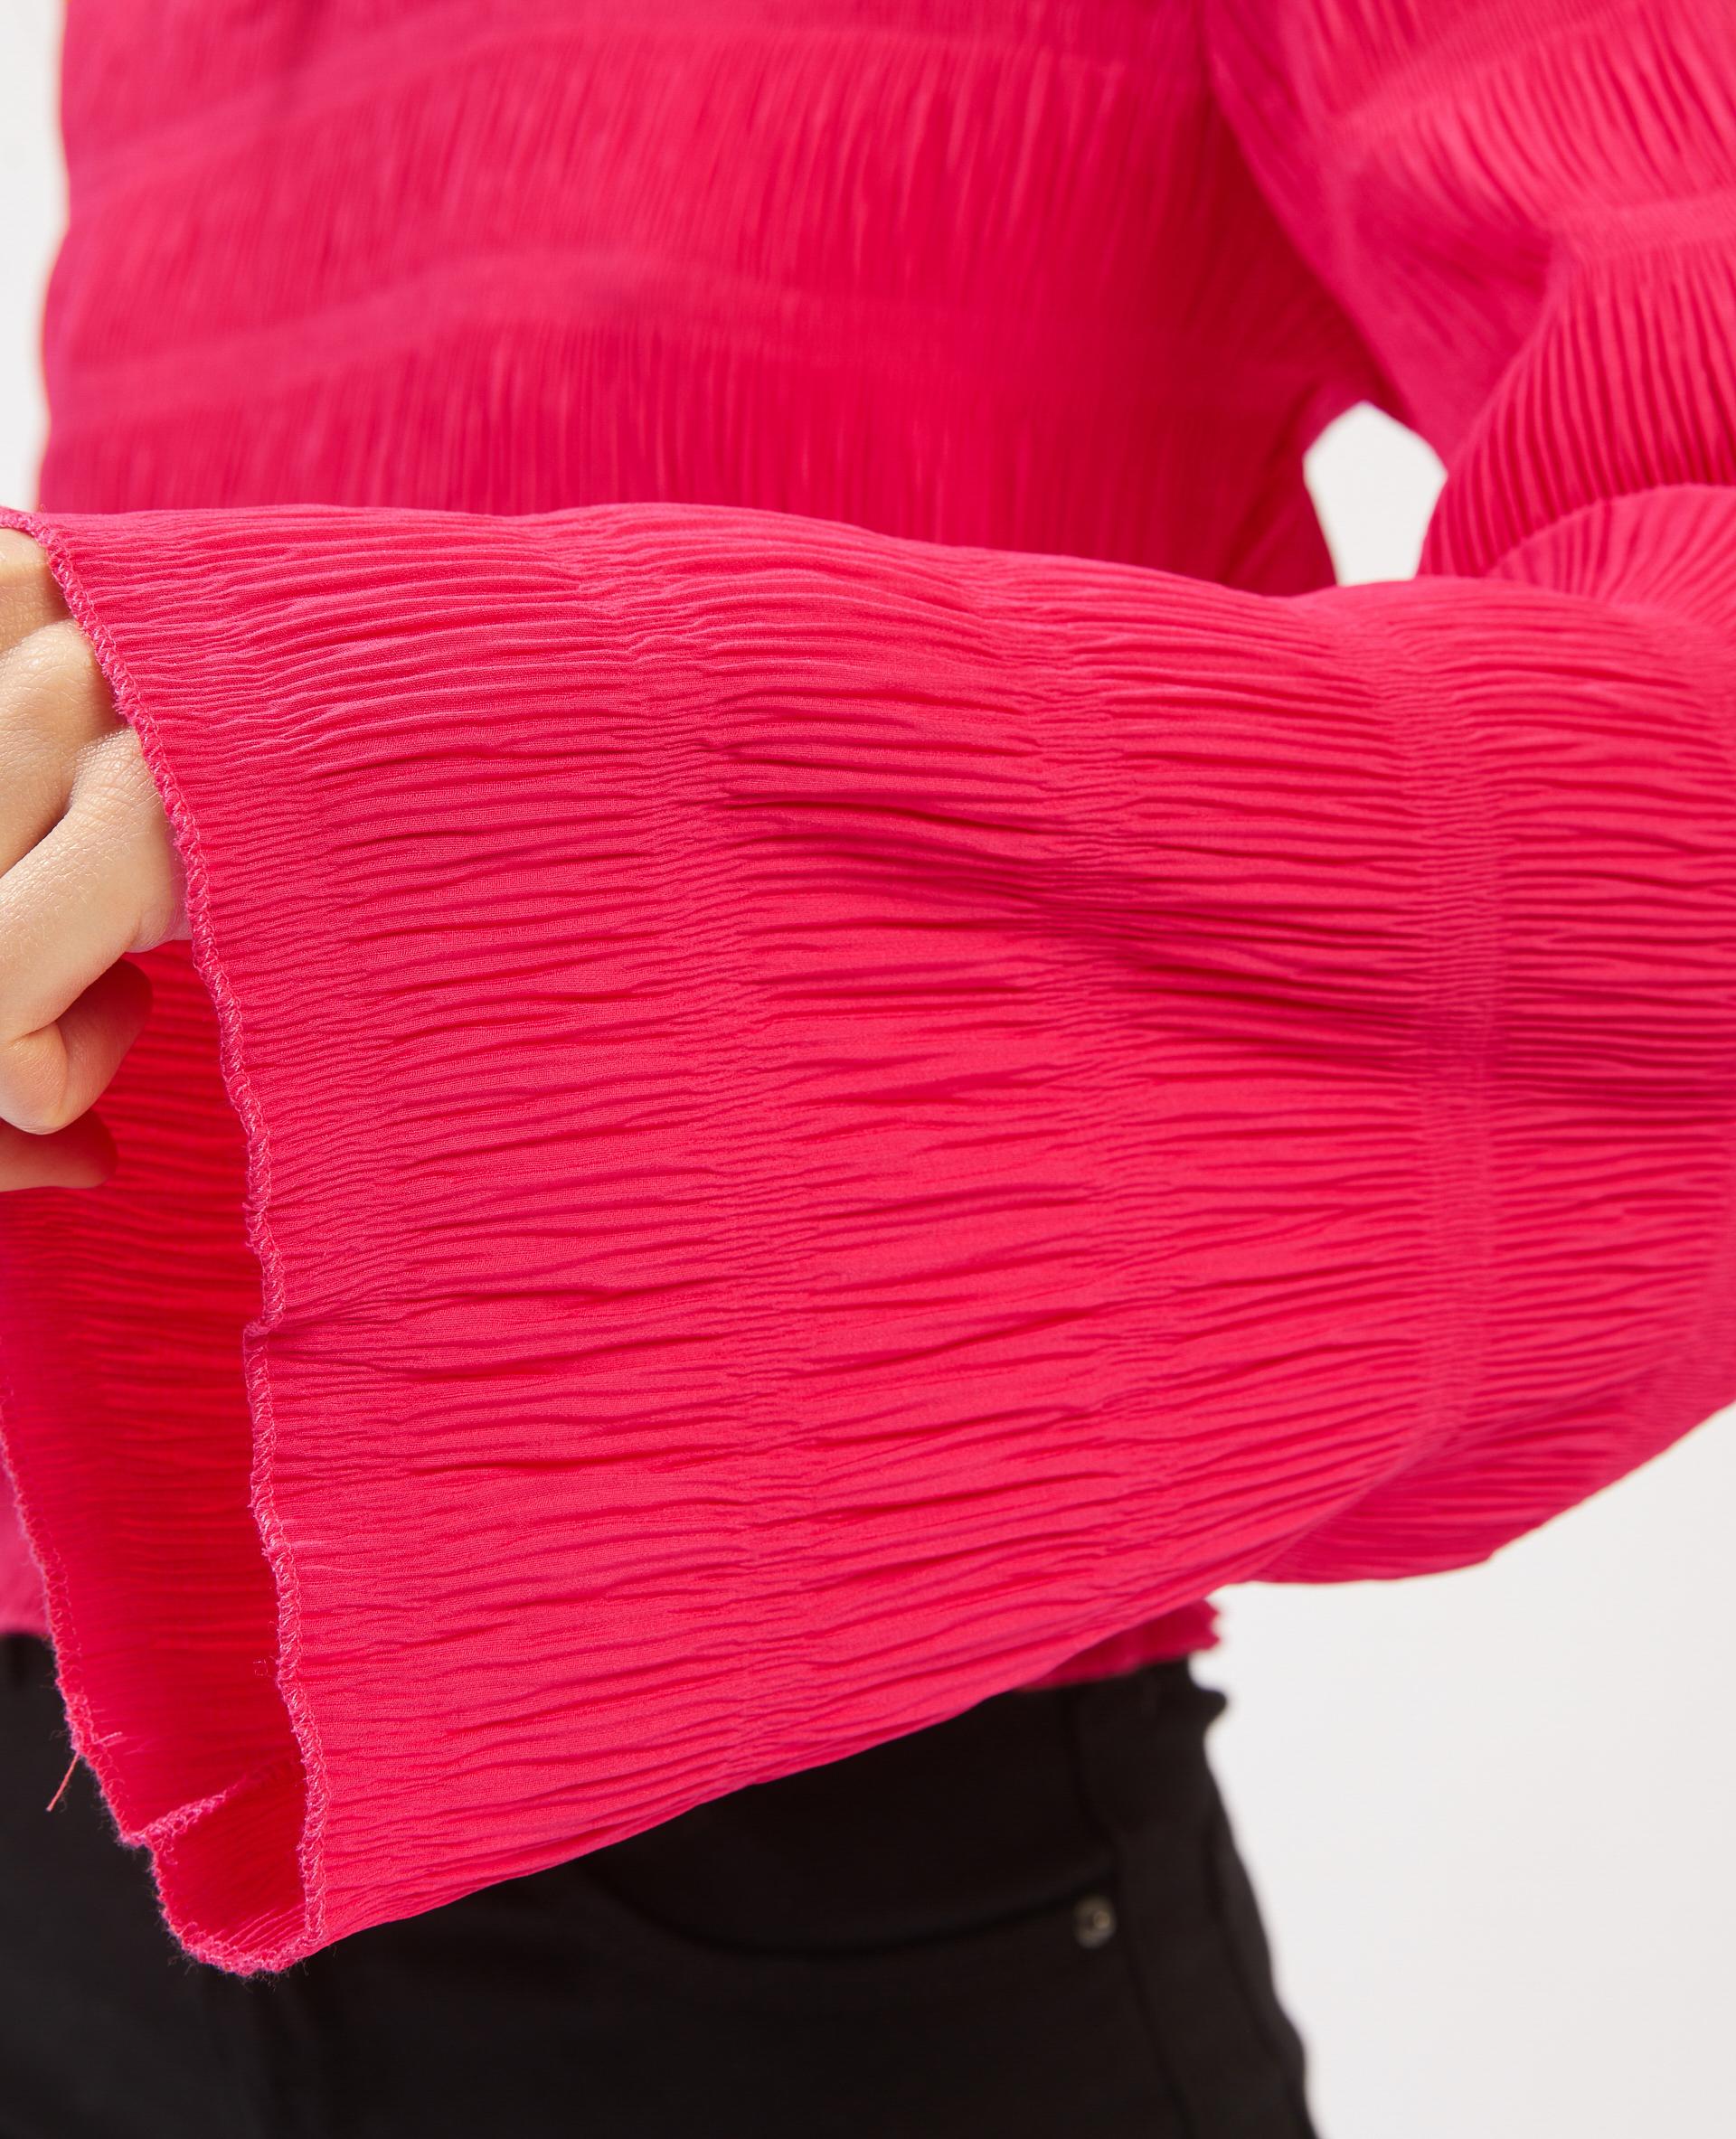 Top effetto plissettato rosa - Pimkie